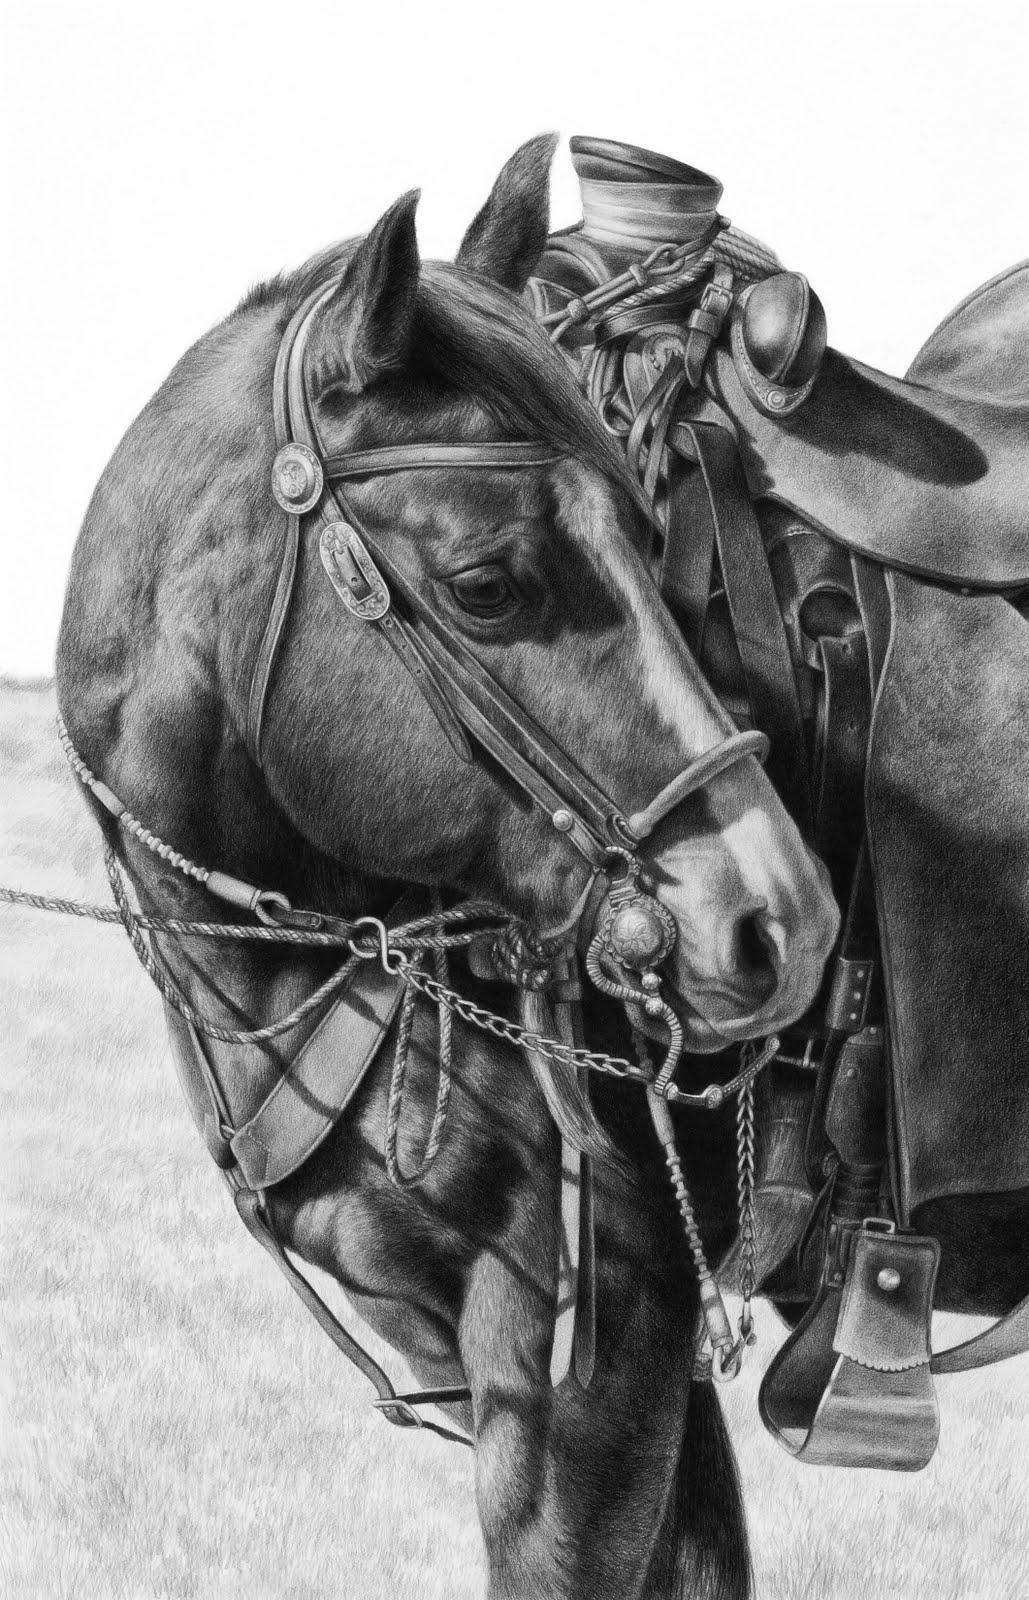 Horse drawing | Horse Happy | Pinterest | Coloring, Pencil ...  |Horse Art Drawings